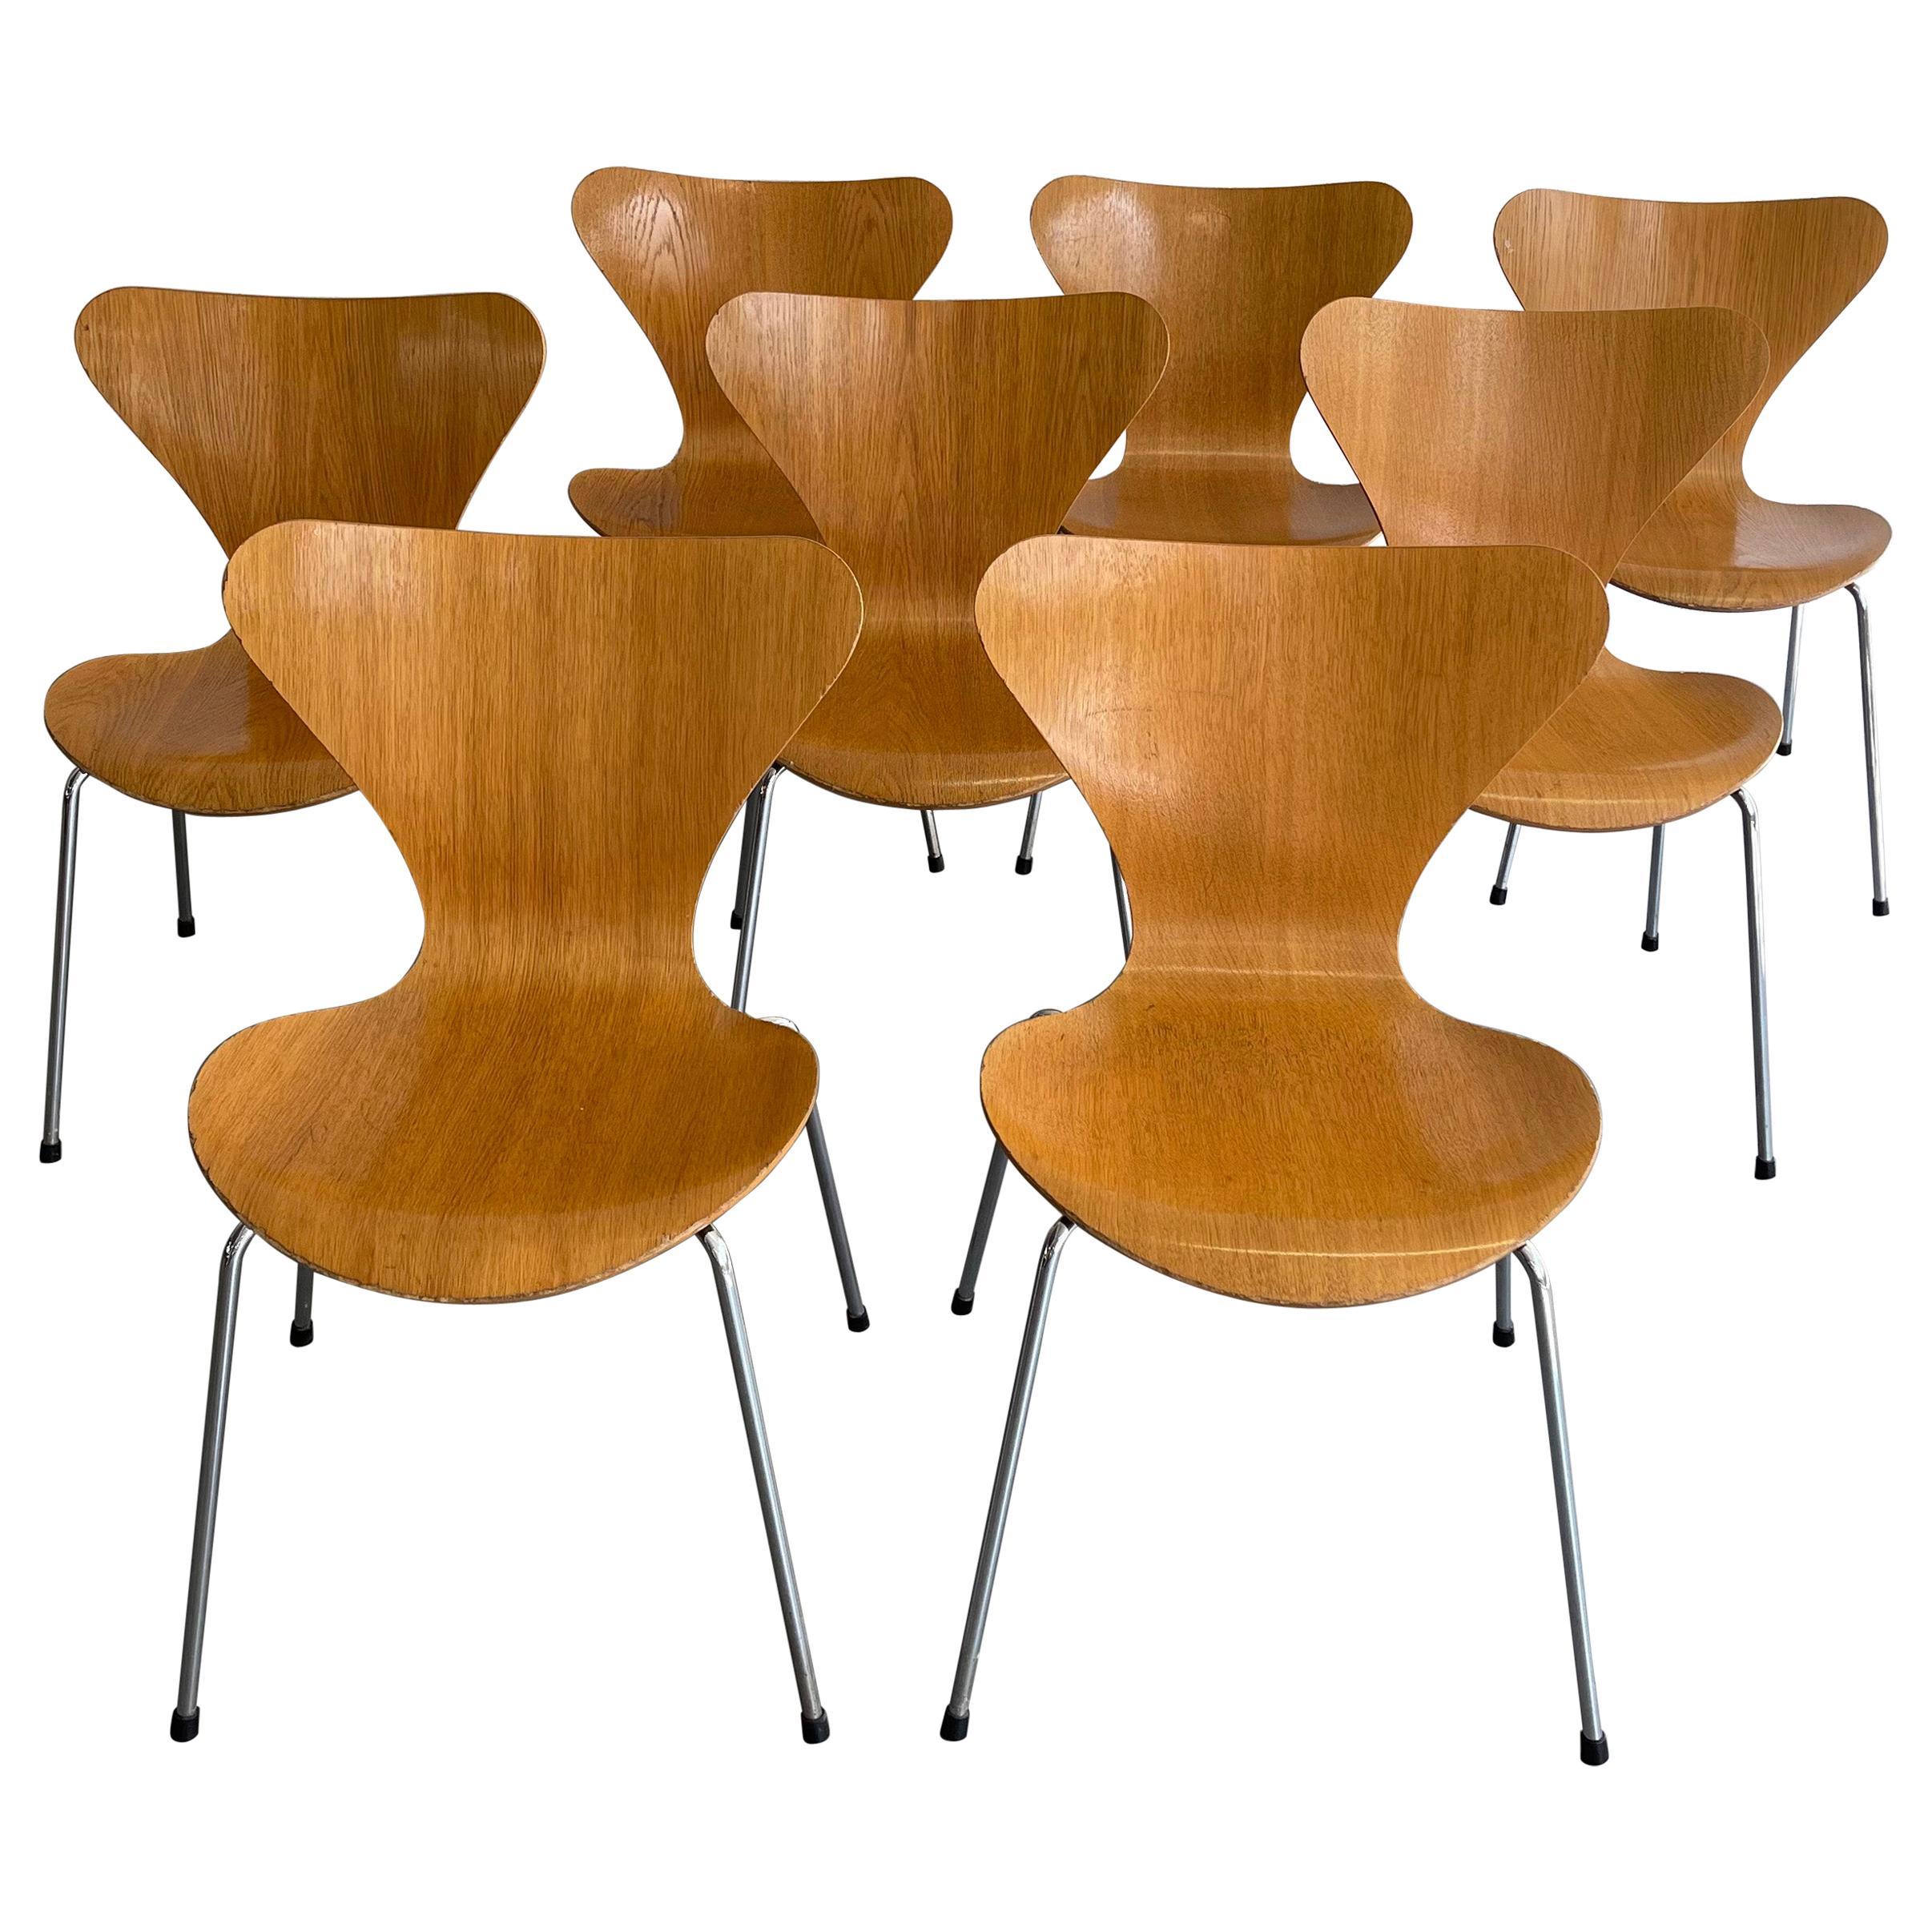 Series 7 Chairs by Arne Jacobsen for Fritz Hansen